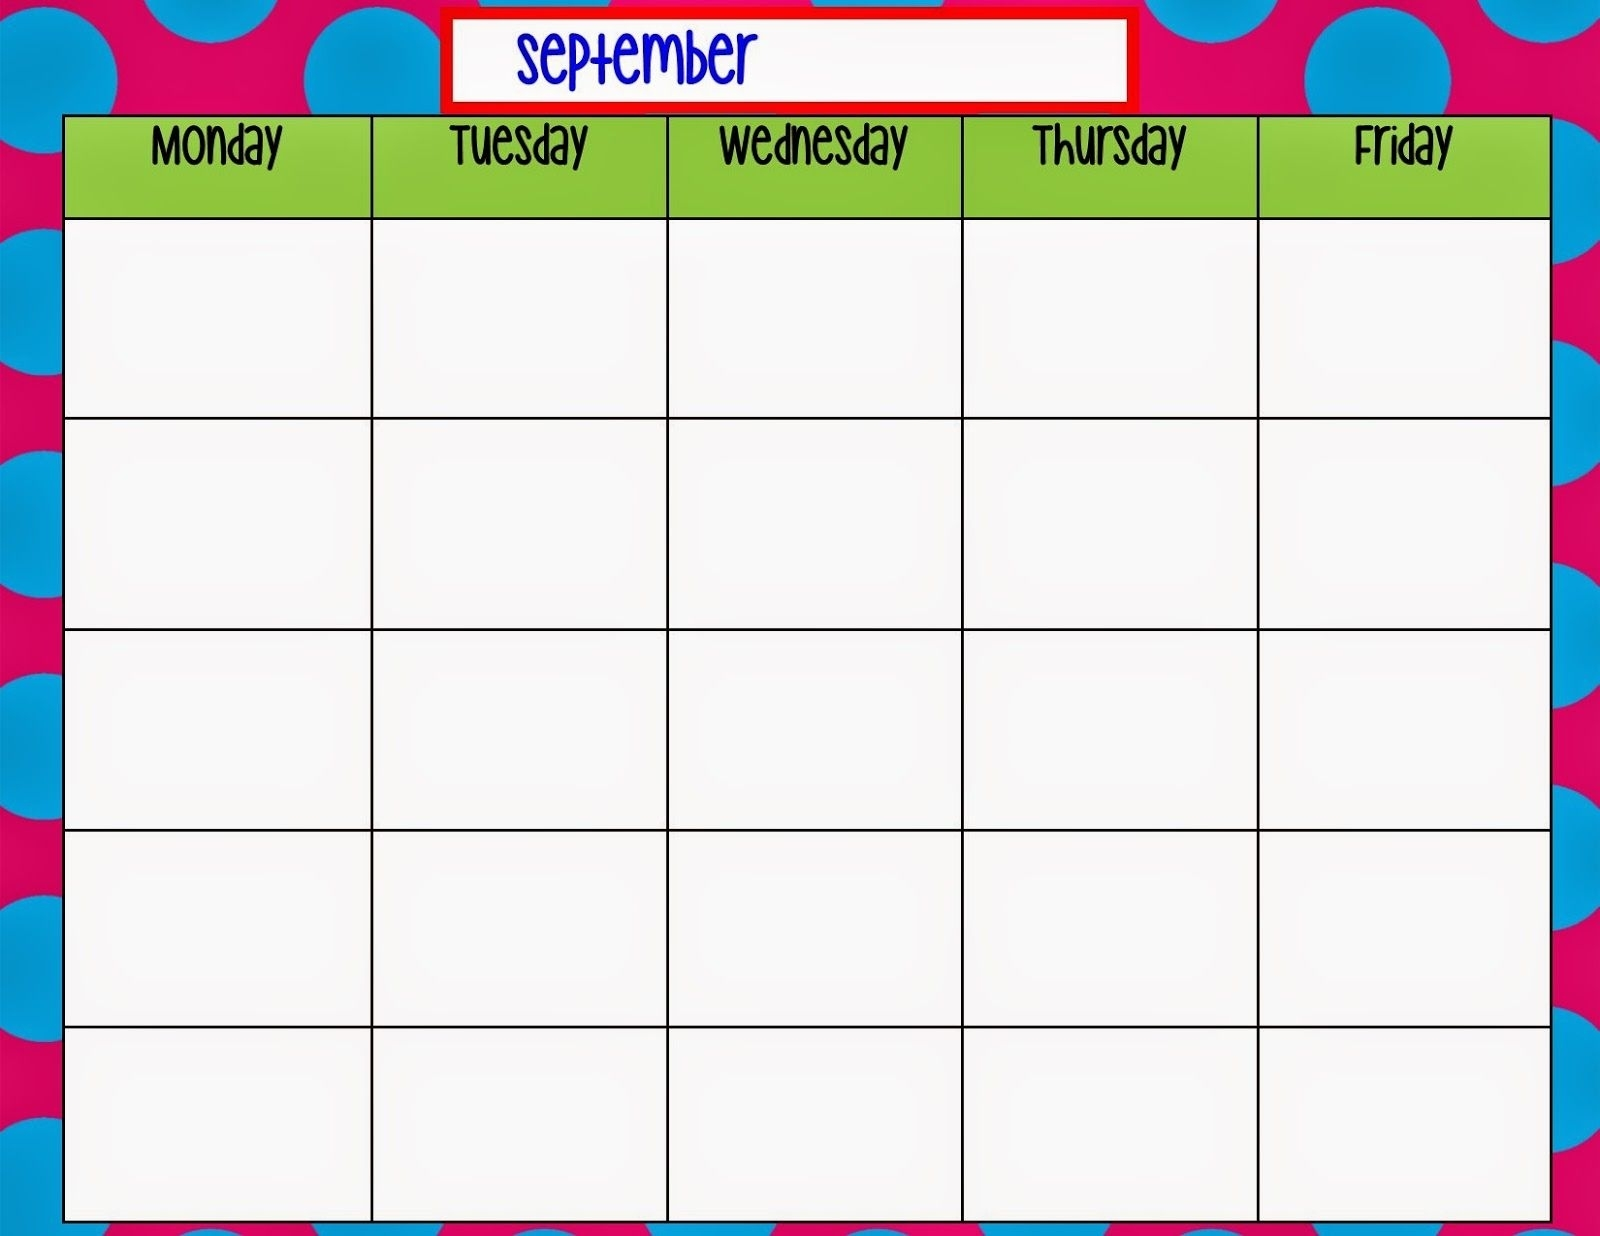 Monday Through Friday Calendar Template   Weekly Calendar Blank Monday Through Friday Schedule Word